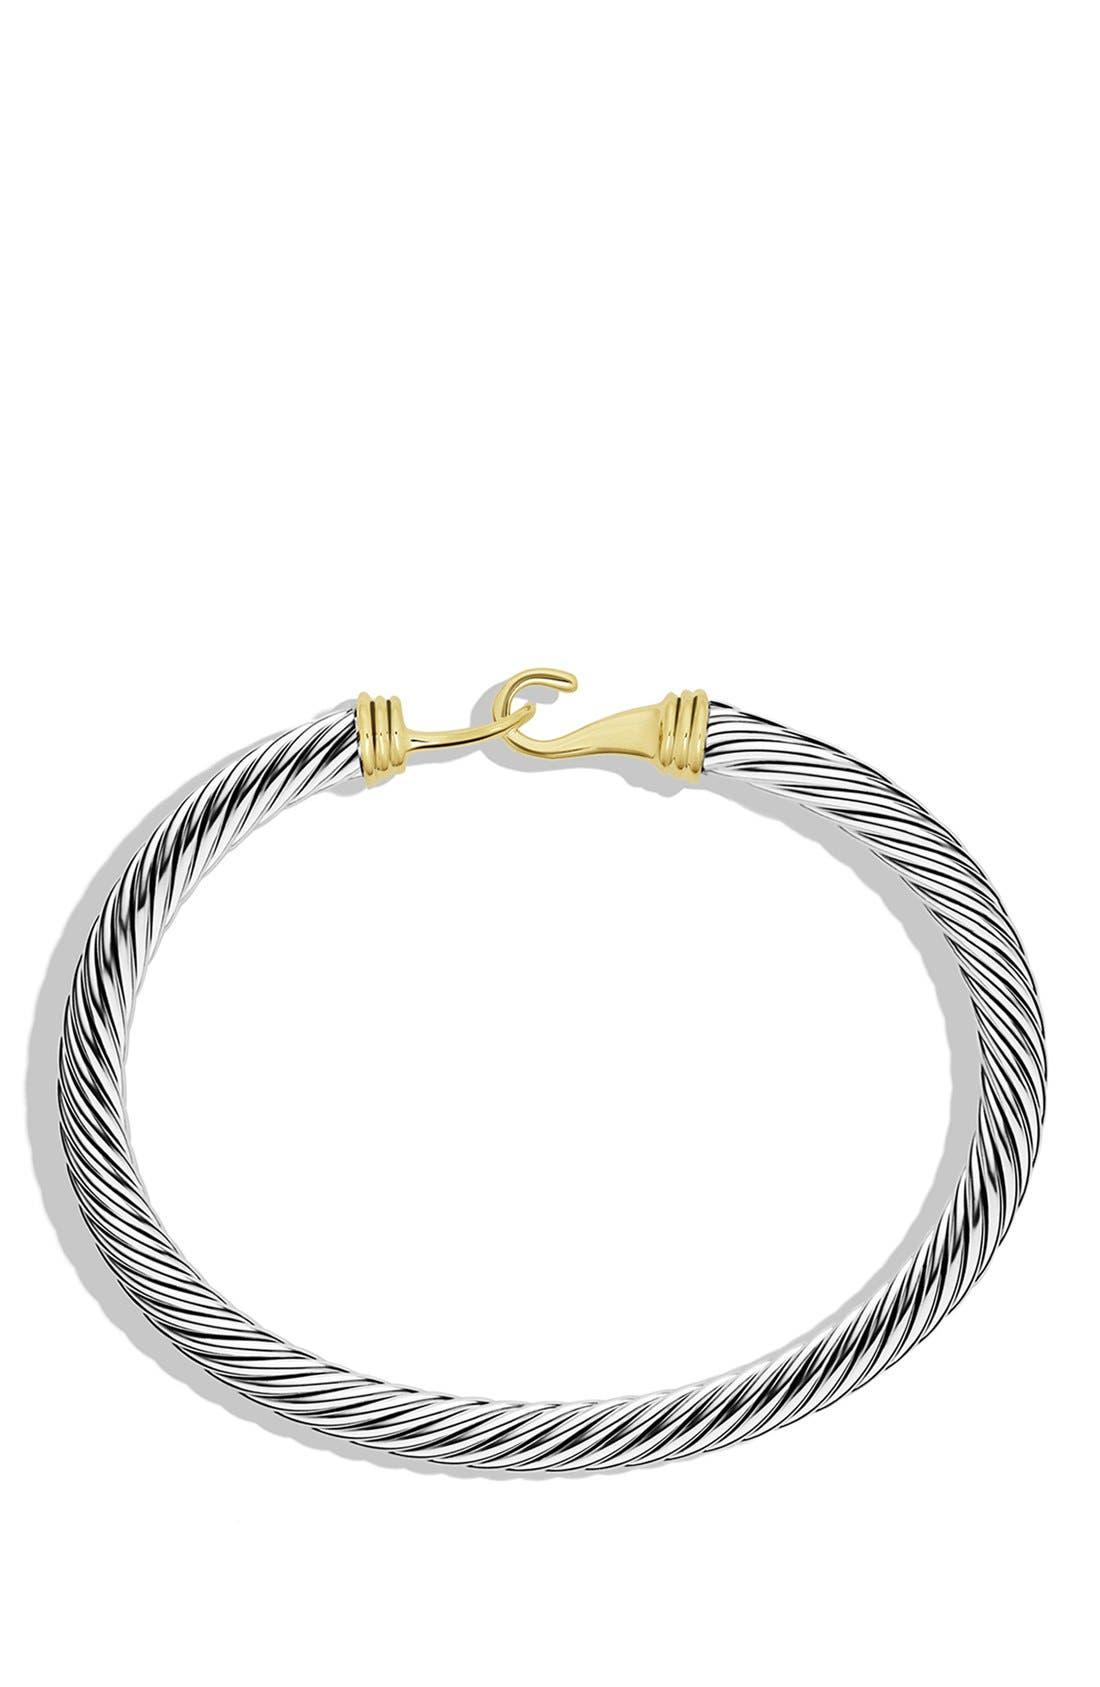 Alternate Image 2  - David Yurman 'Cable Buckle' Bracelet with Gold